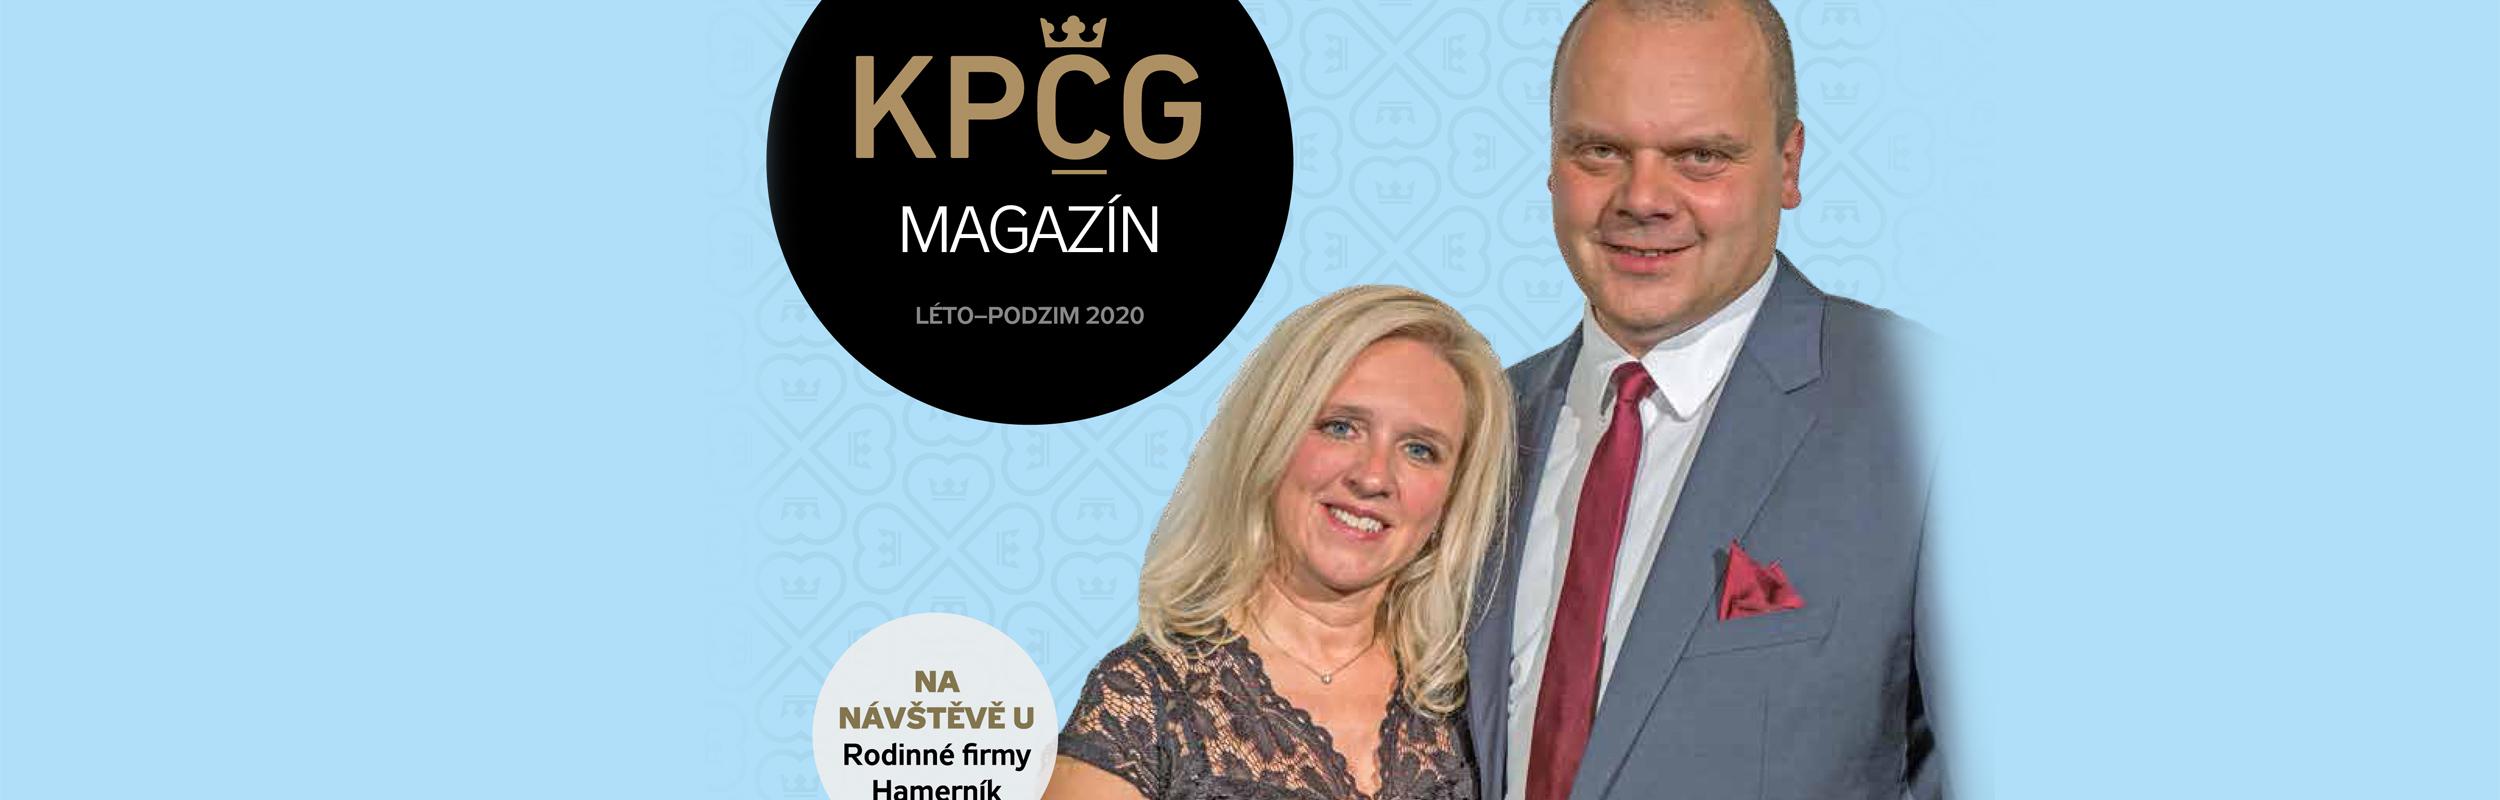 22. 7. 2020   KPCG Magazín Léto 2020